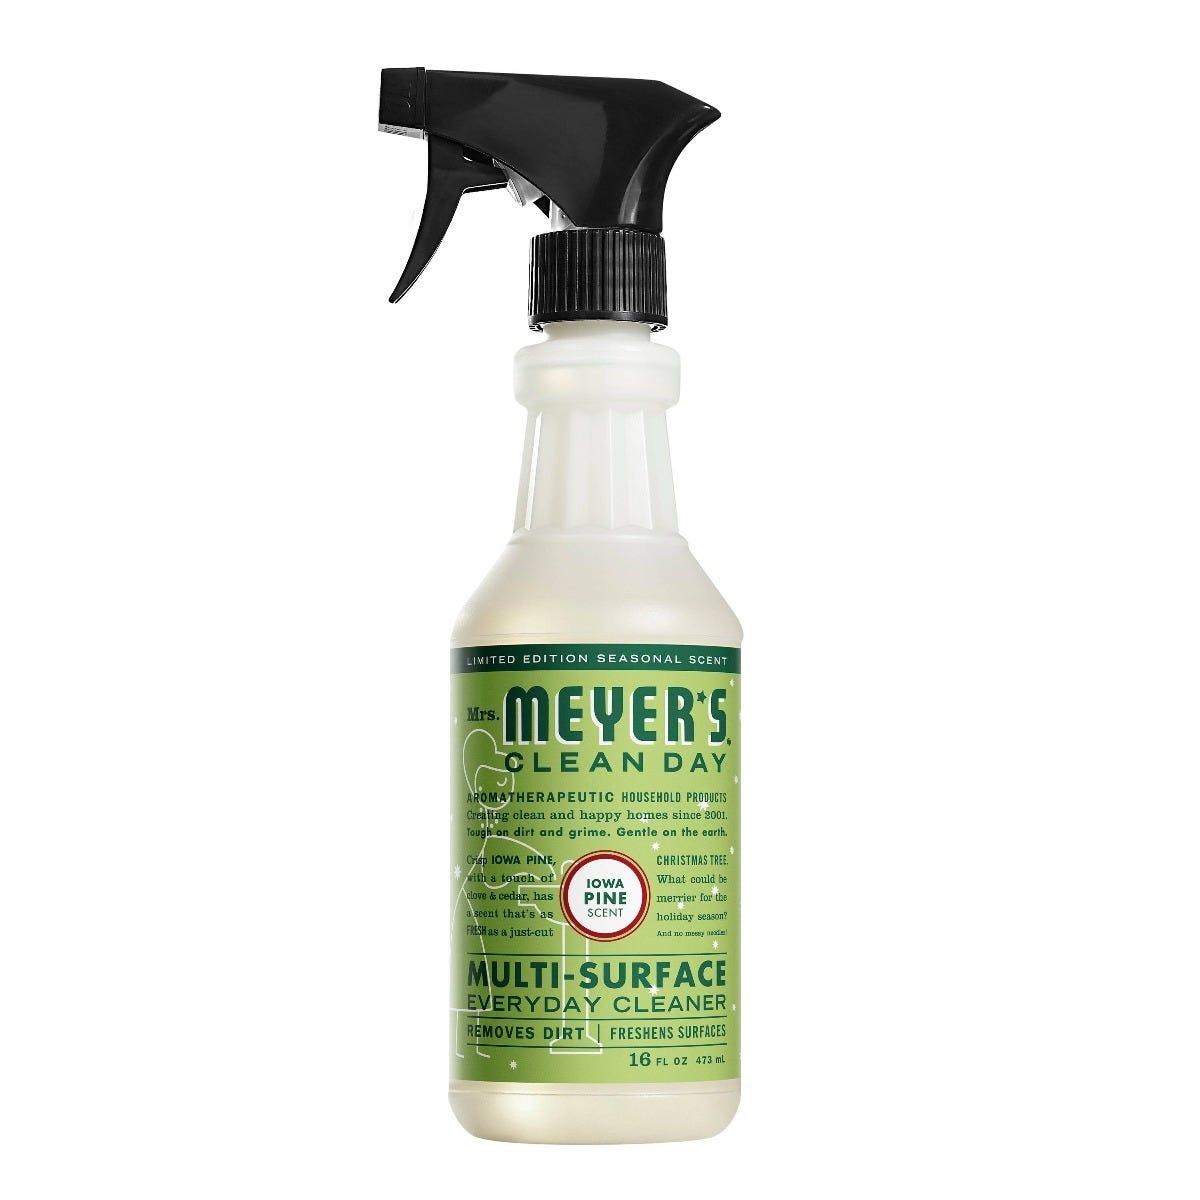 Limpiador de superficies Mrs. Meyer's® en spray aroma Iowa Pine